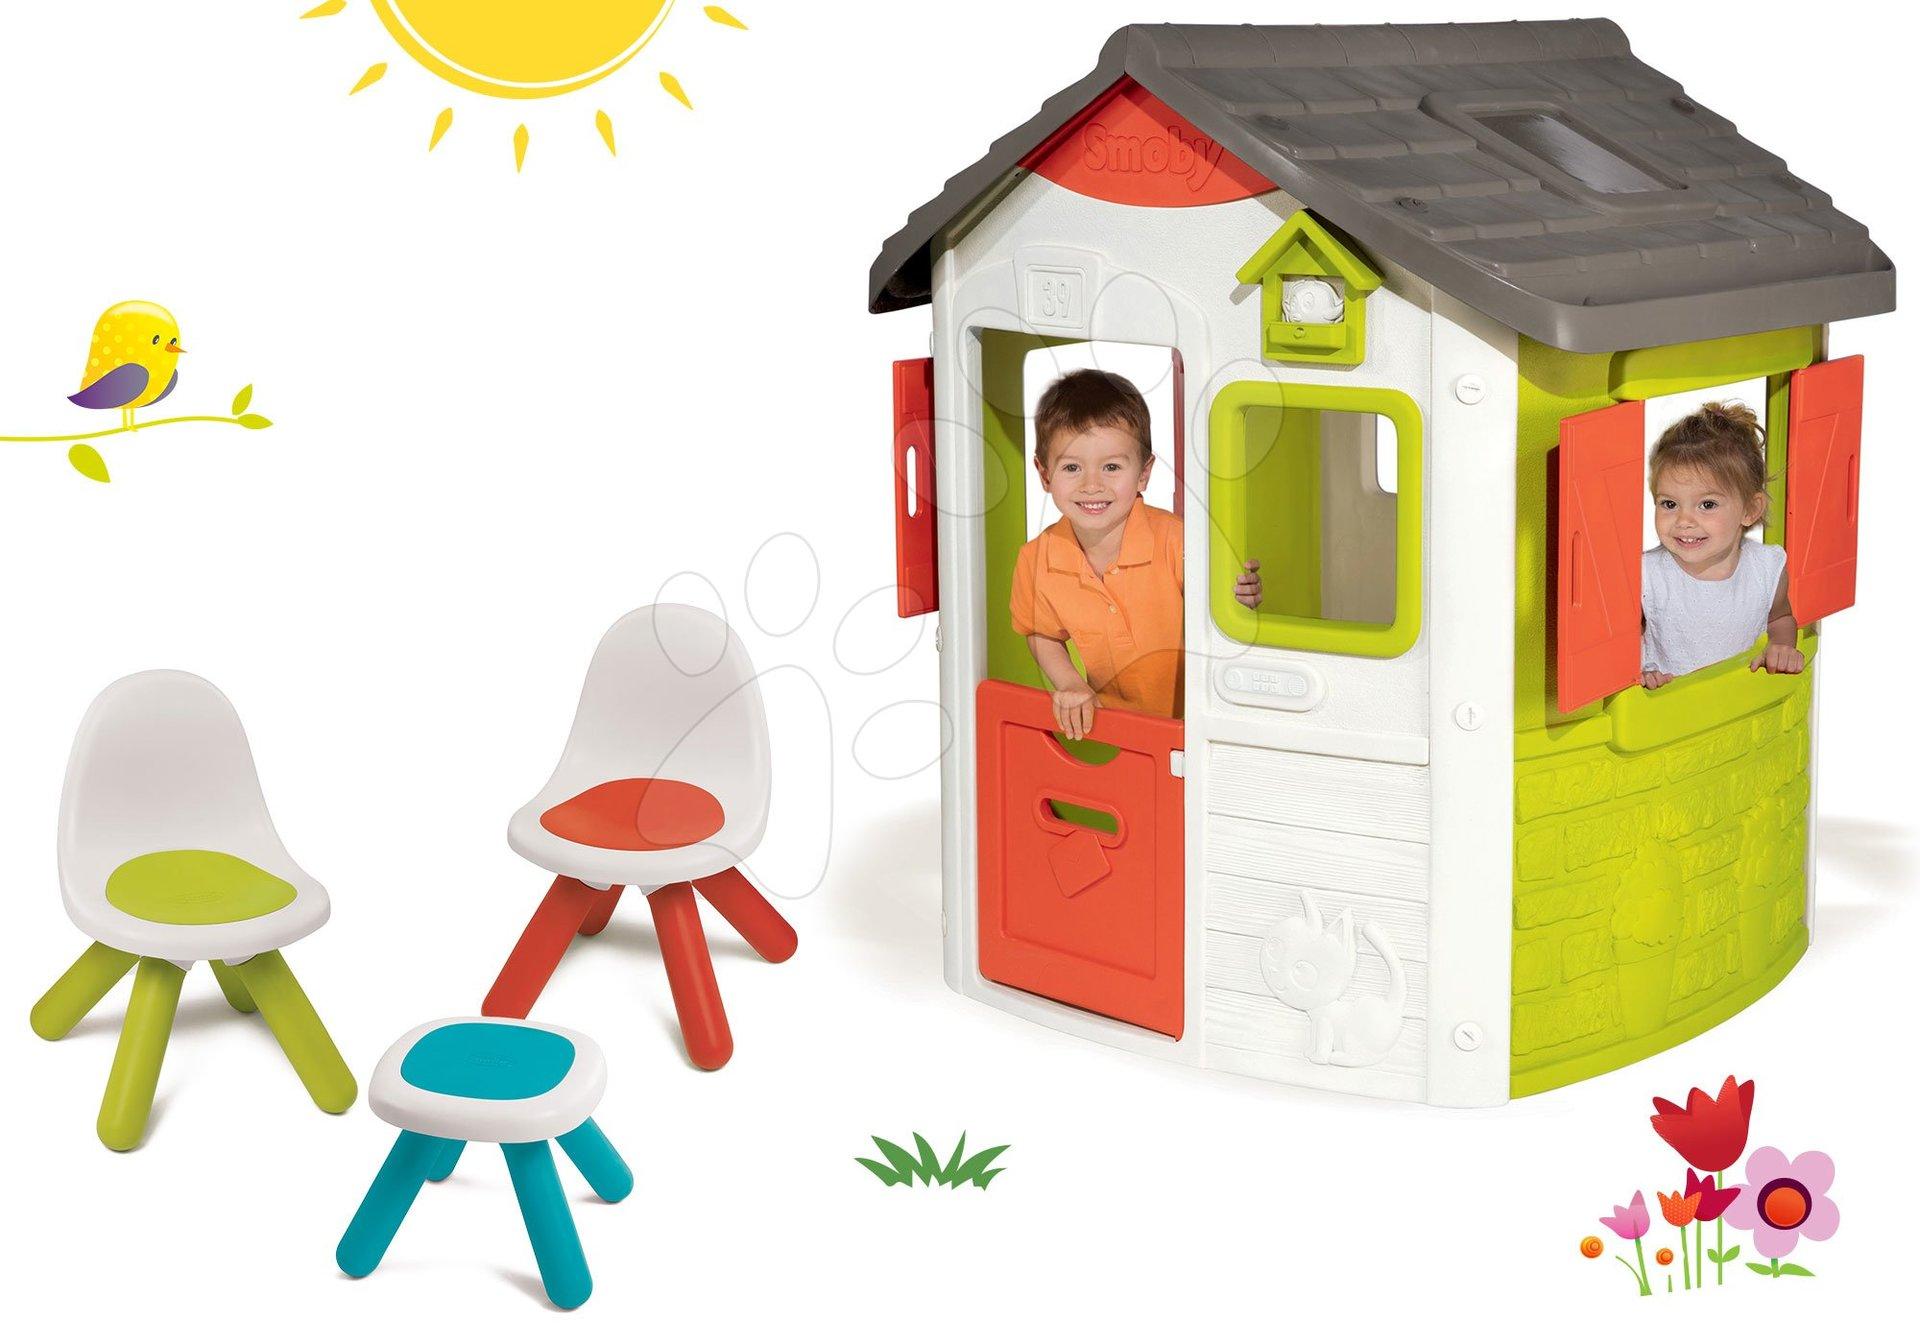 Domčeky s nábytkom - Set domček Neo Jura Lodge Smoby s dvoma dverami a piknik stolík s dvoma stoličkami KidChair Red